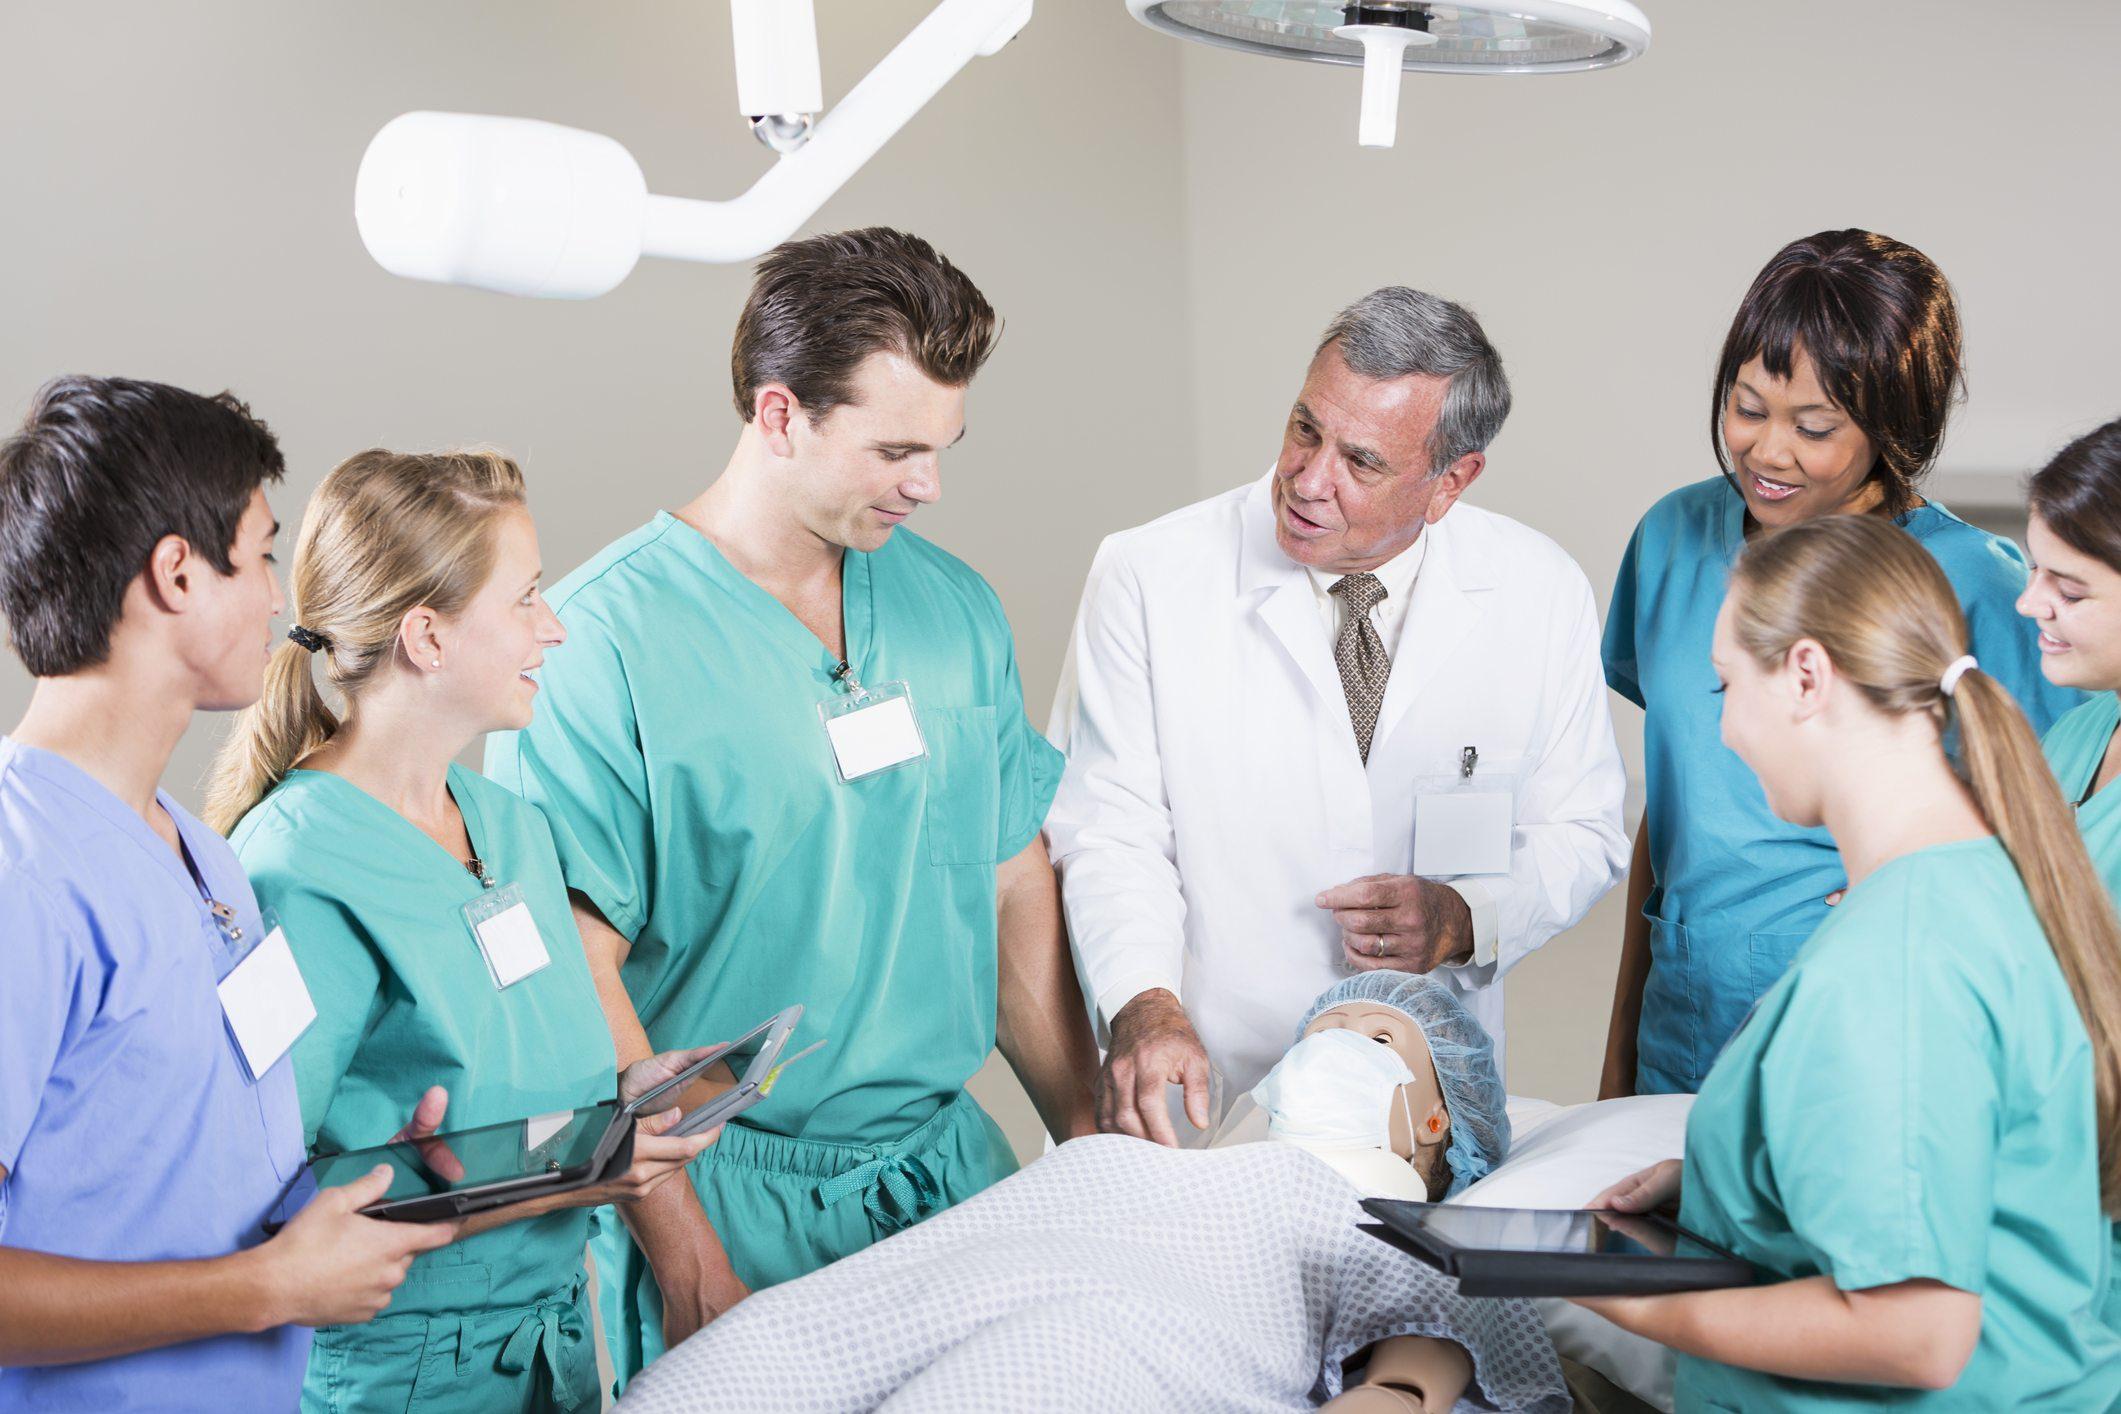 student doctor program back - HD2121×1414